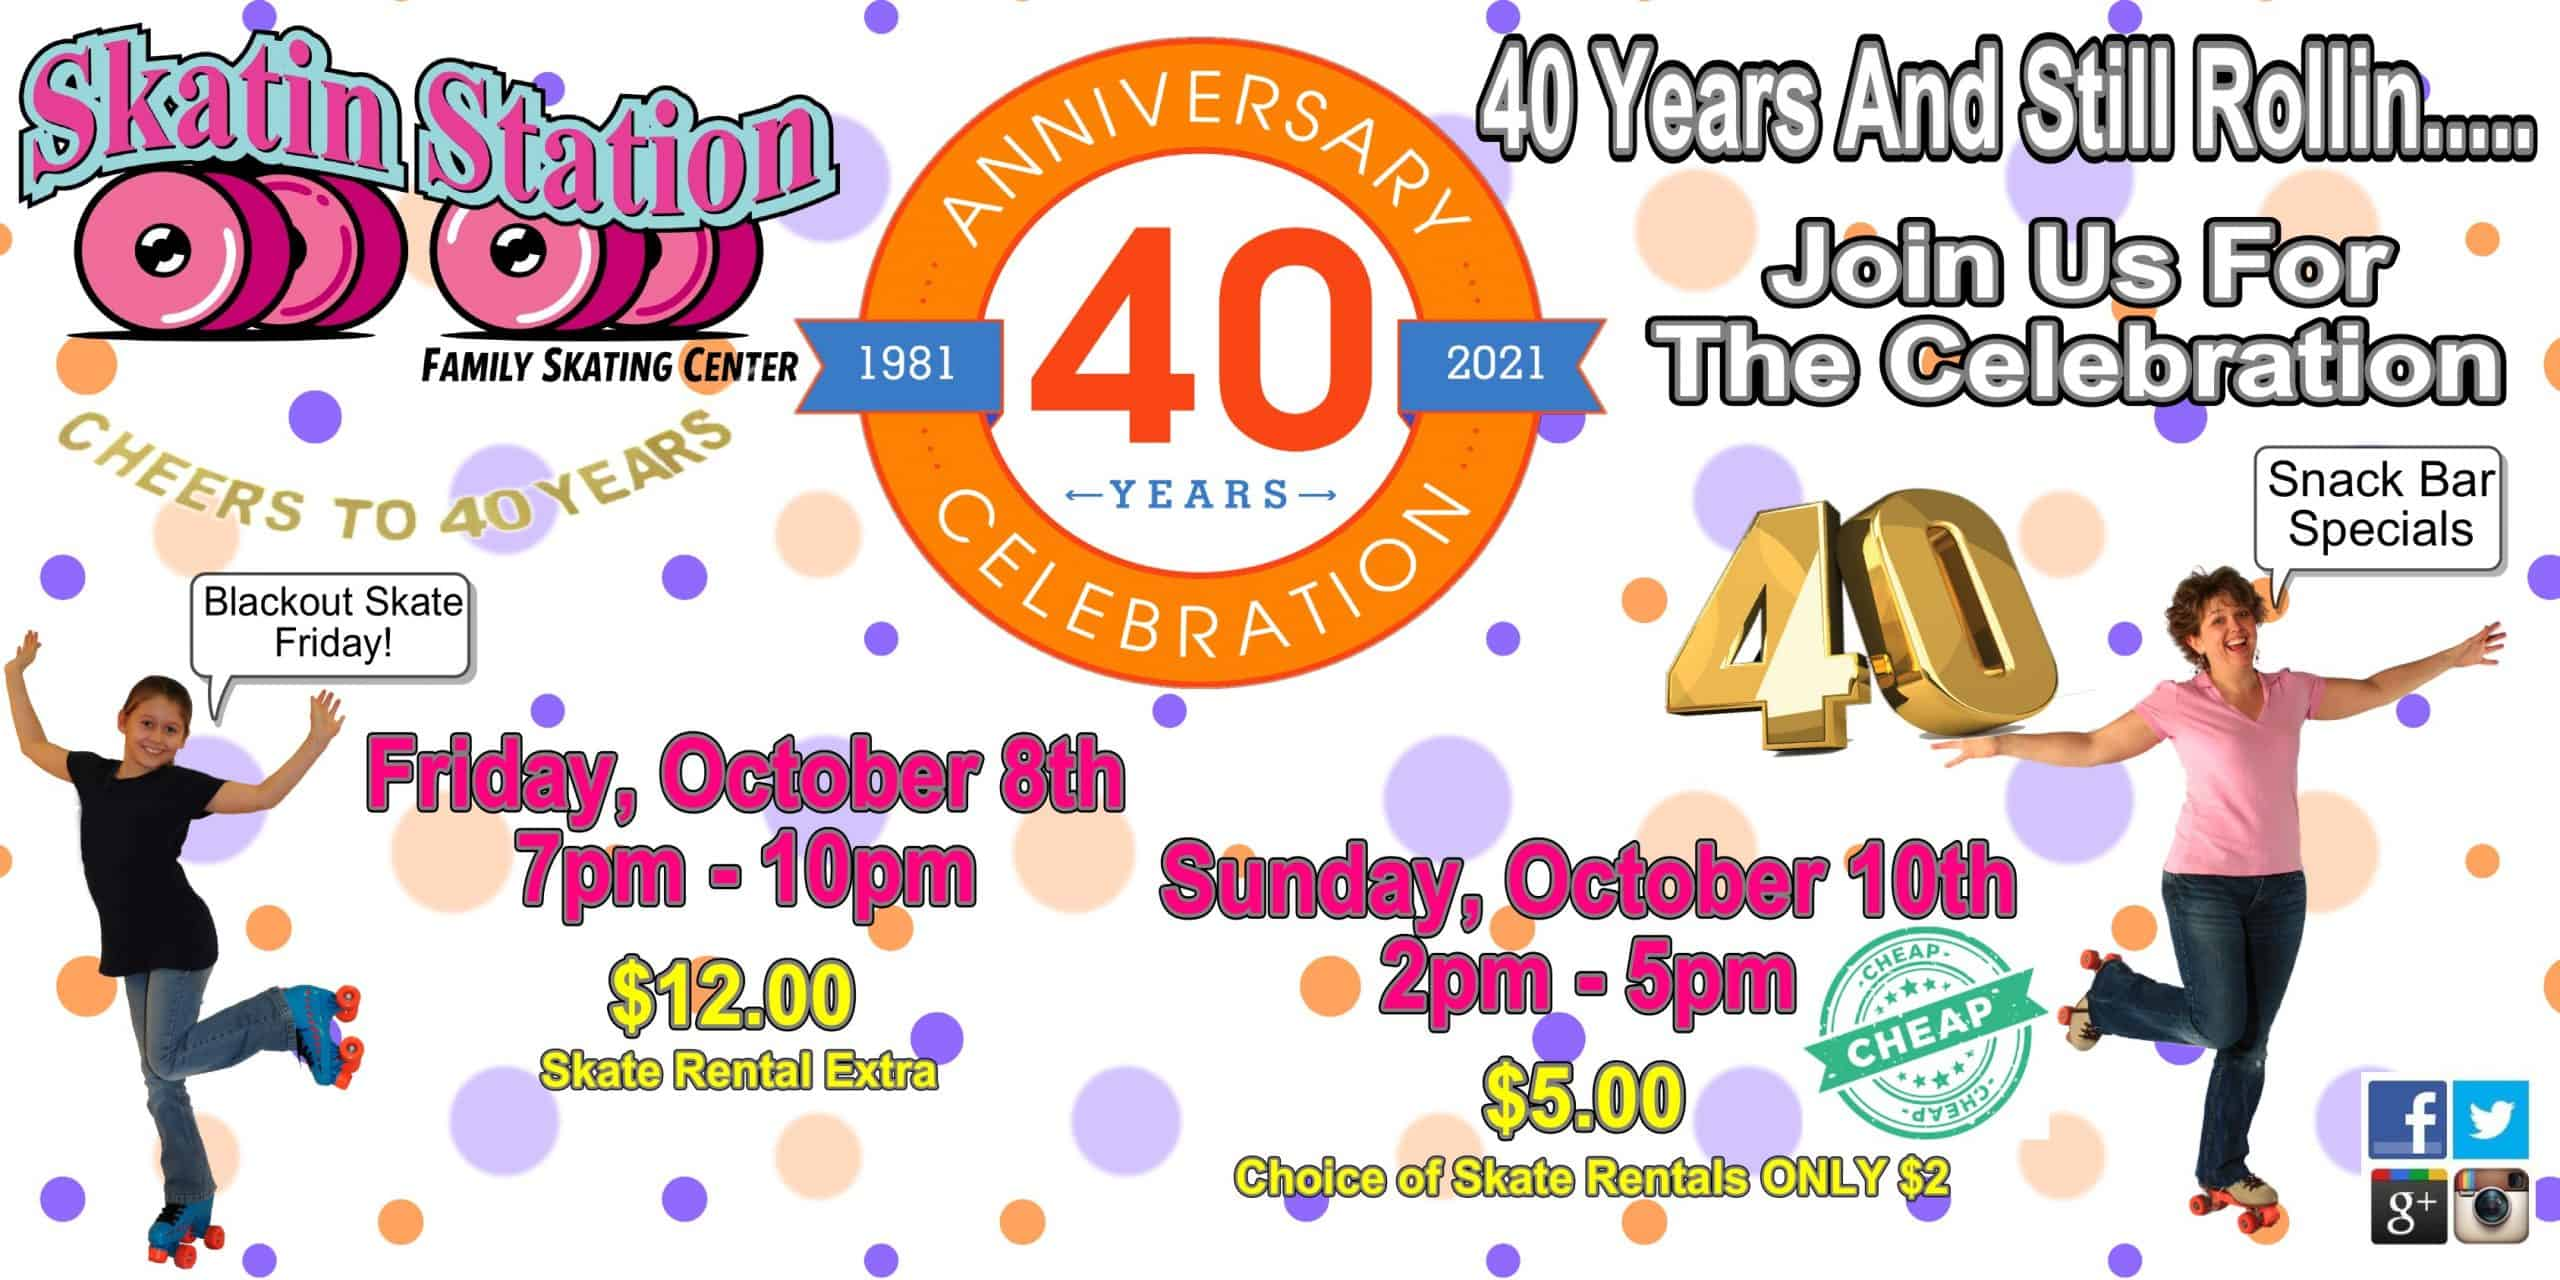 SS 40th Anniversary